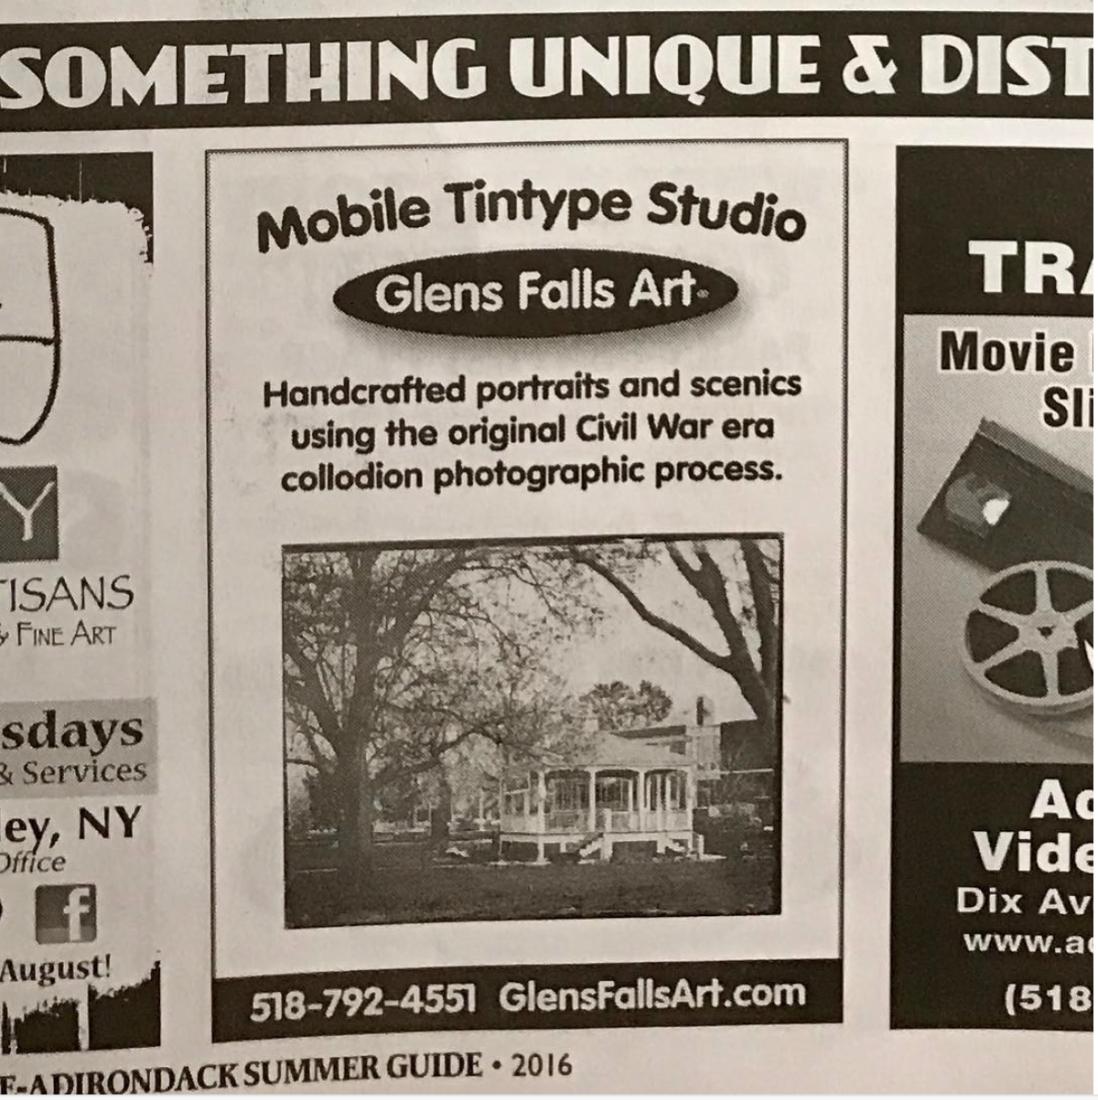 Original fine art at Glens Falls Art locations in Glens Falls NY. Watch free! Fine art tintype collodion!